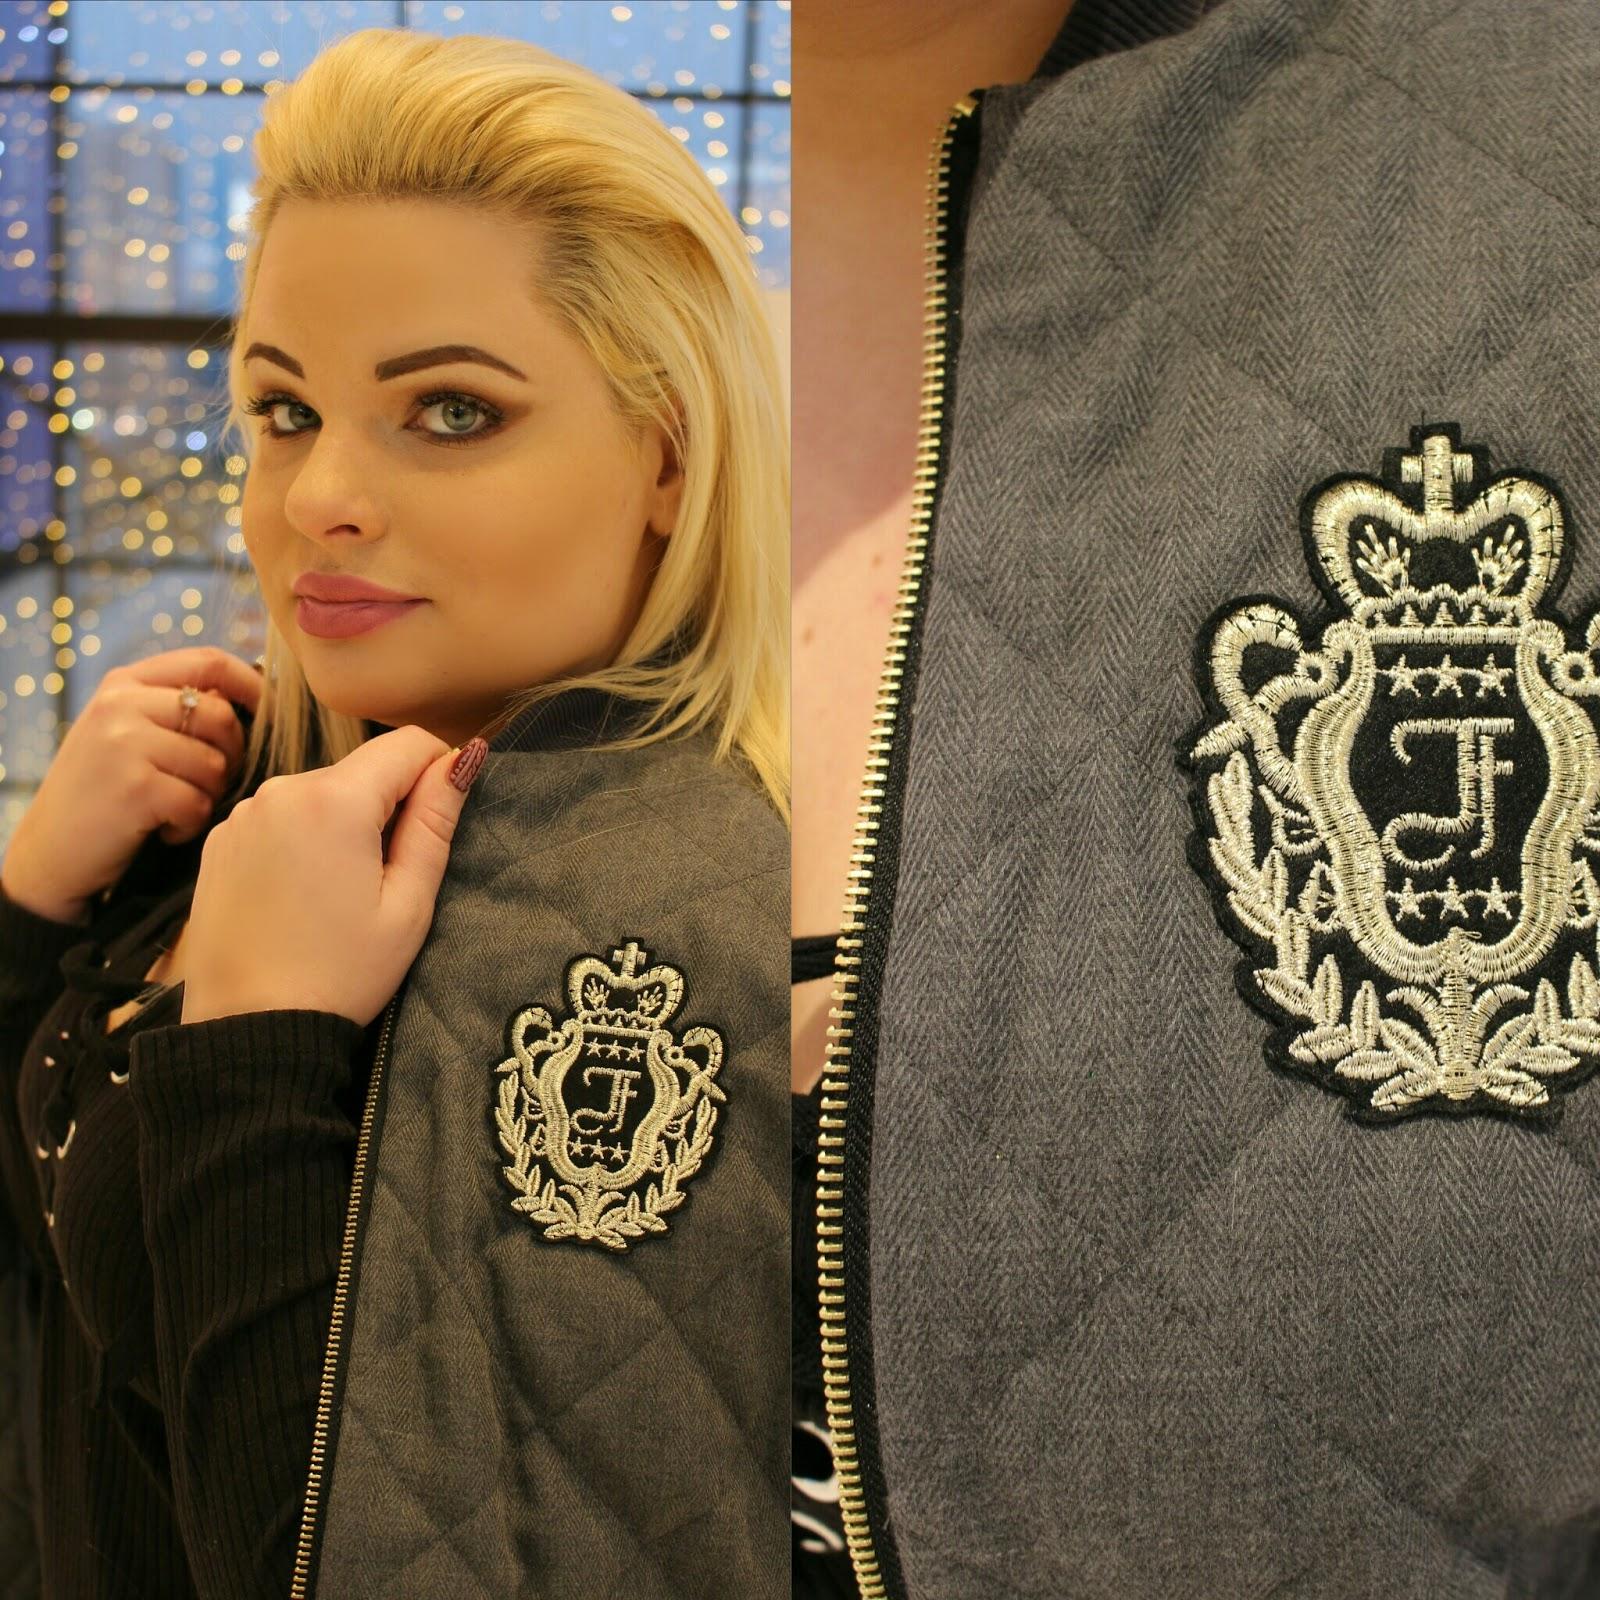 63fe48dd Plus Size Fashion & Models By Paula Perez: Bomber jacket +Size by Taffi